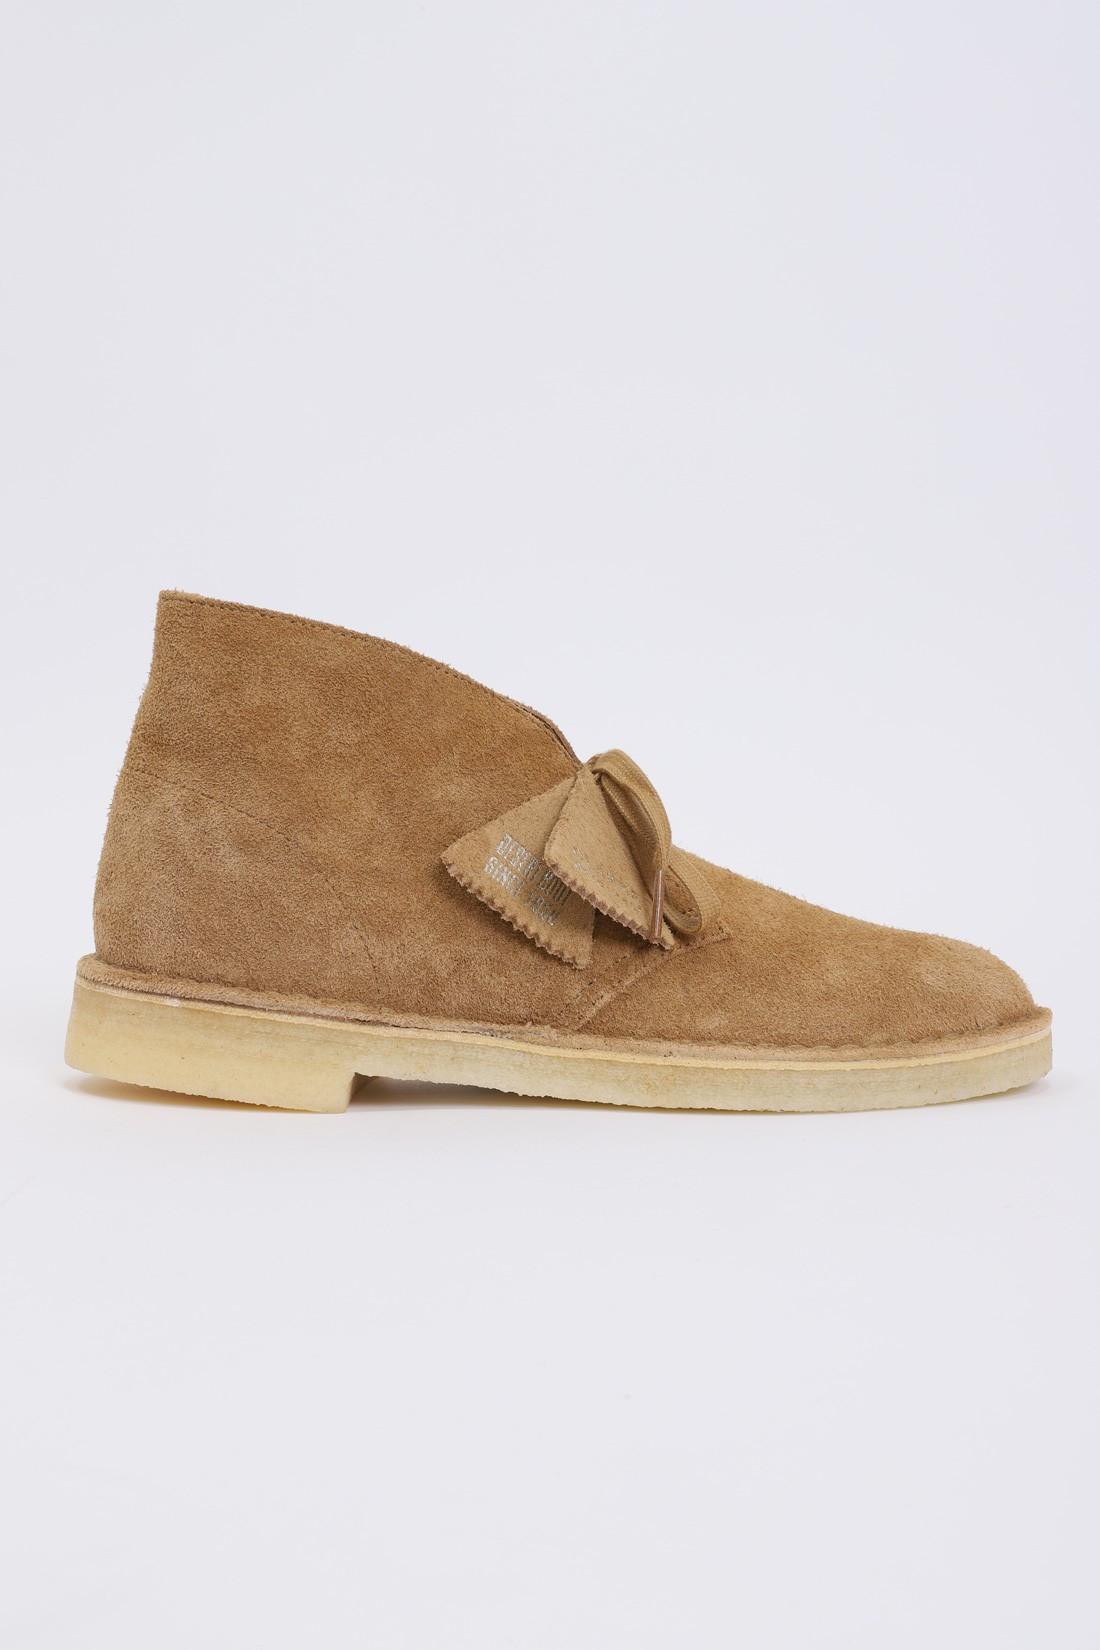 CLARKS ORIGINALS / Desert boot Nutmeg suede